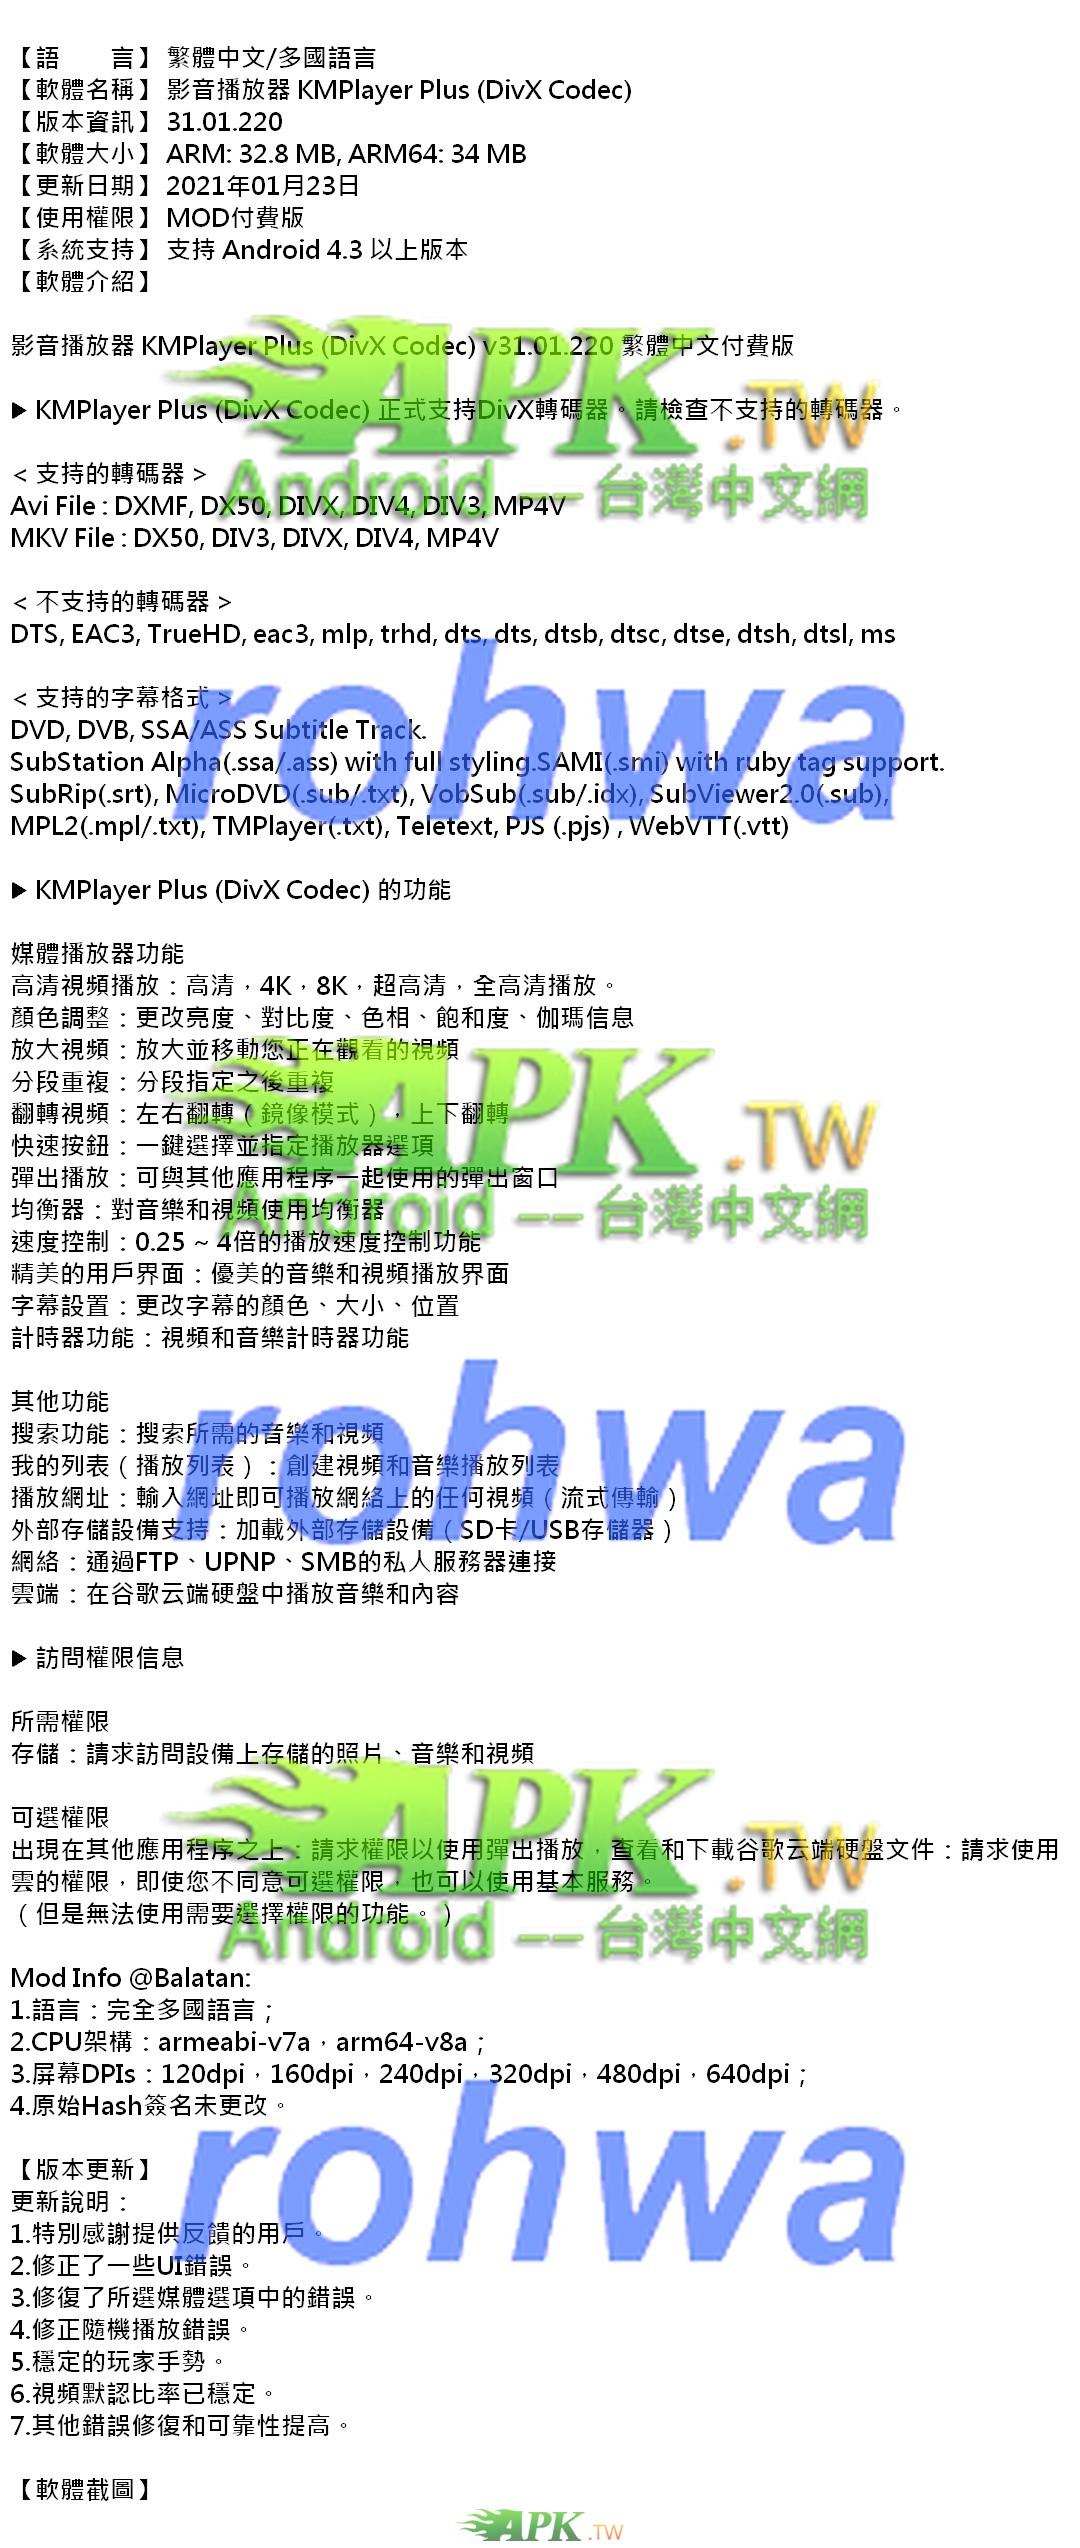 KMPlayer_Plus_DivX_31.01.220_.jpg